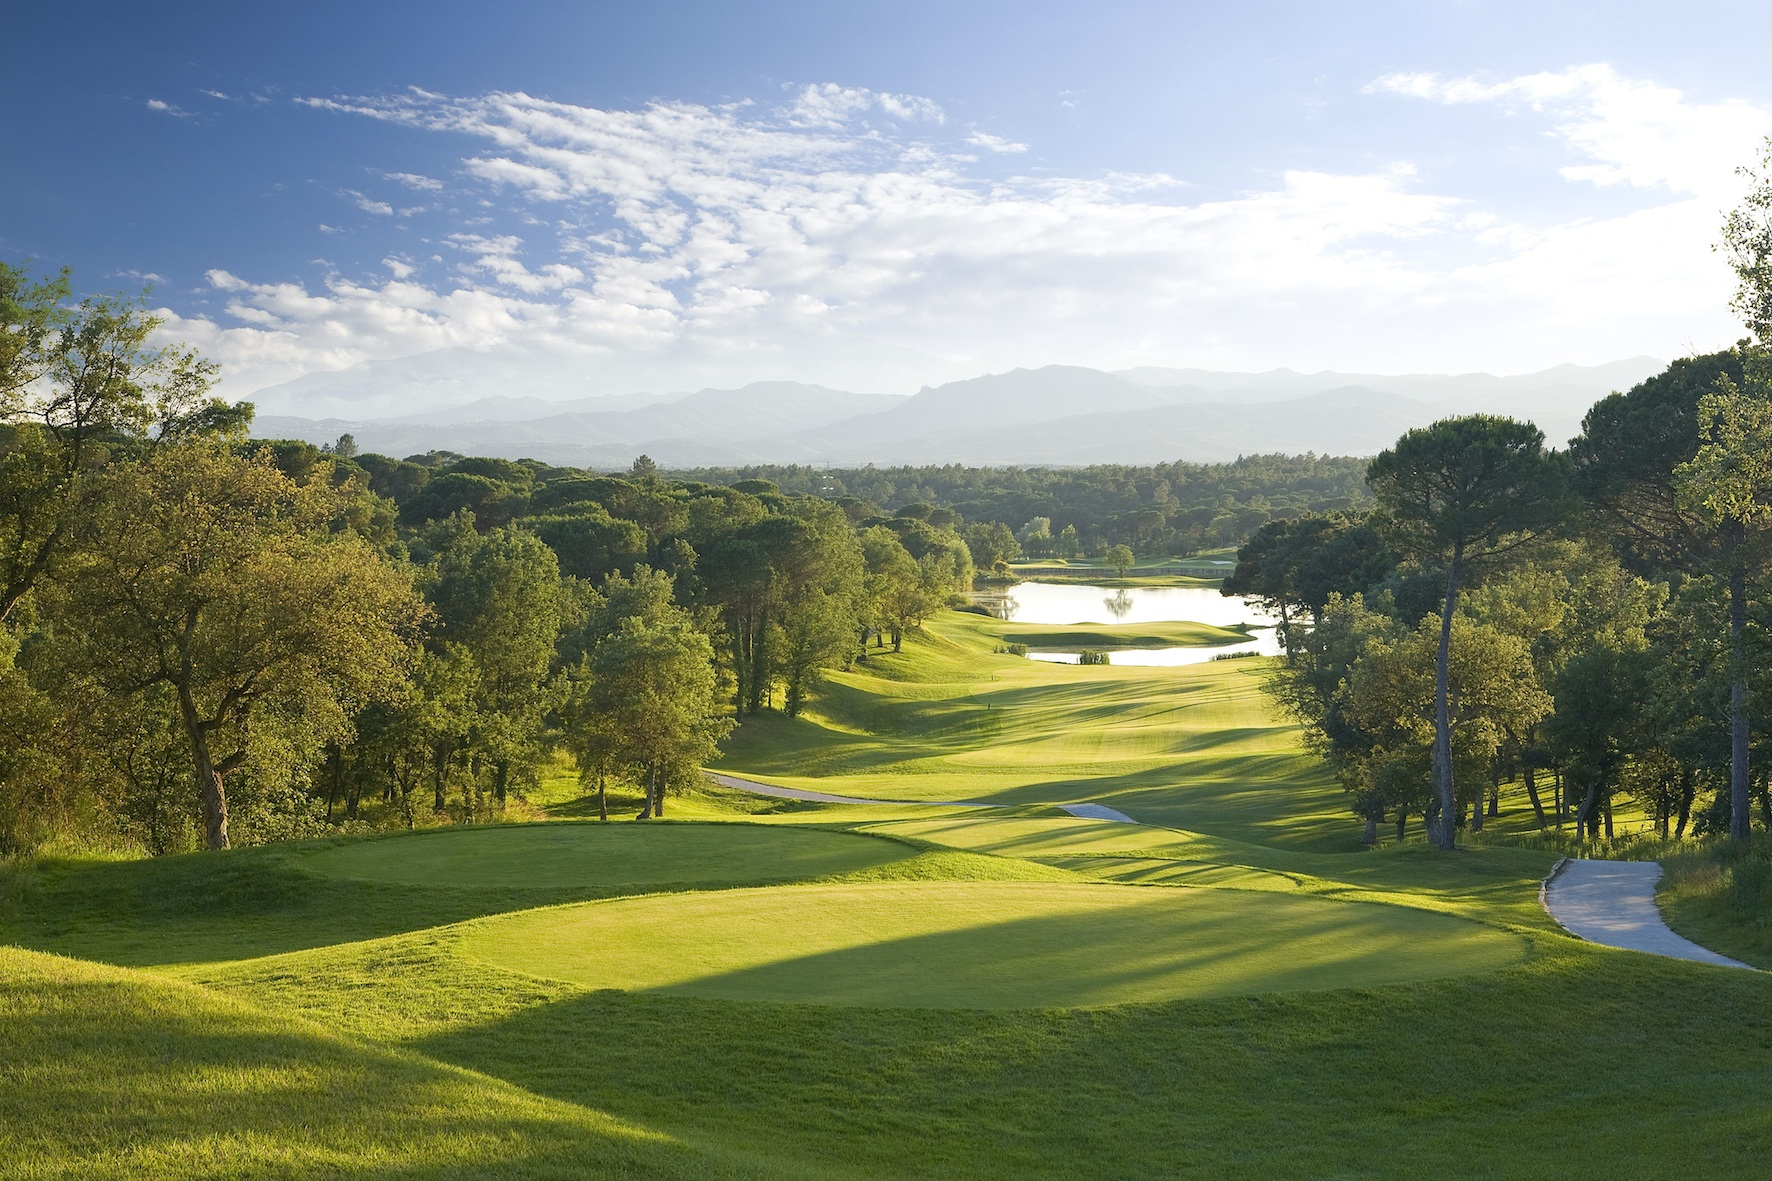 PGA Golf de Catalunya, Girona, Spain